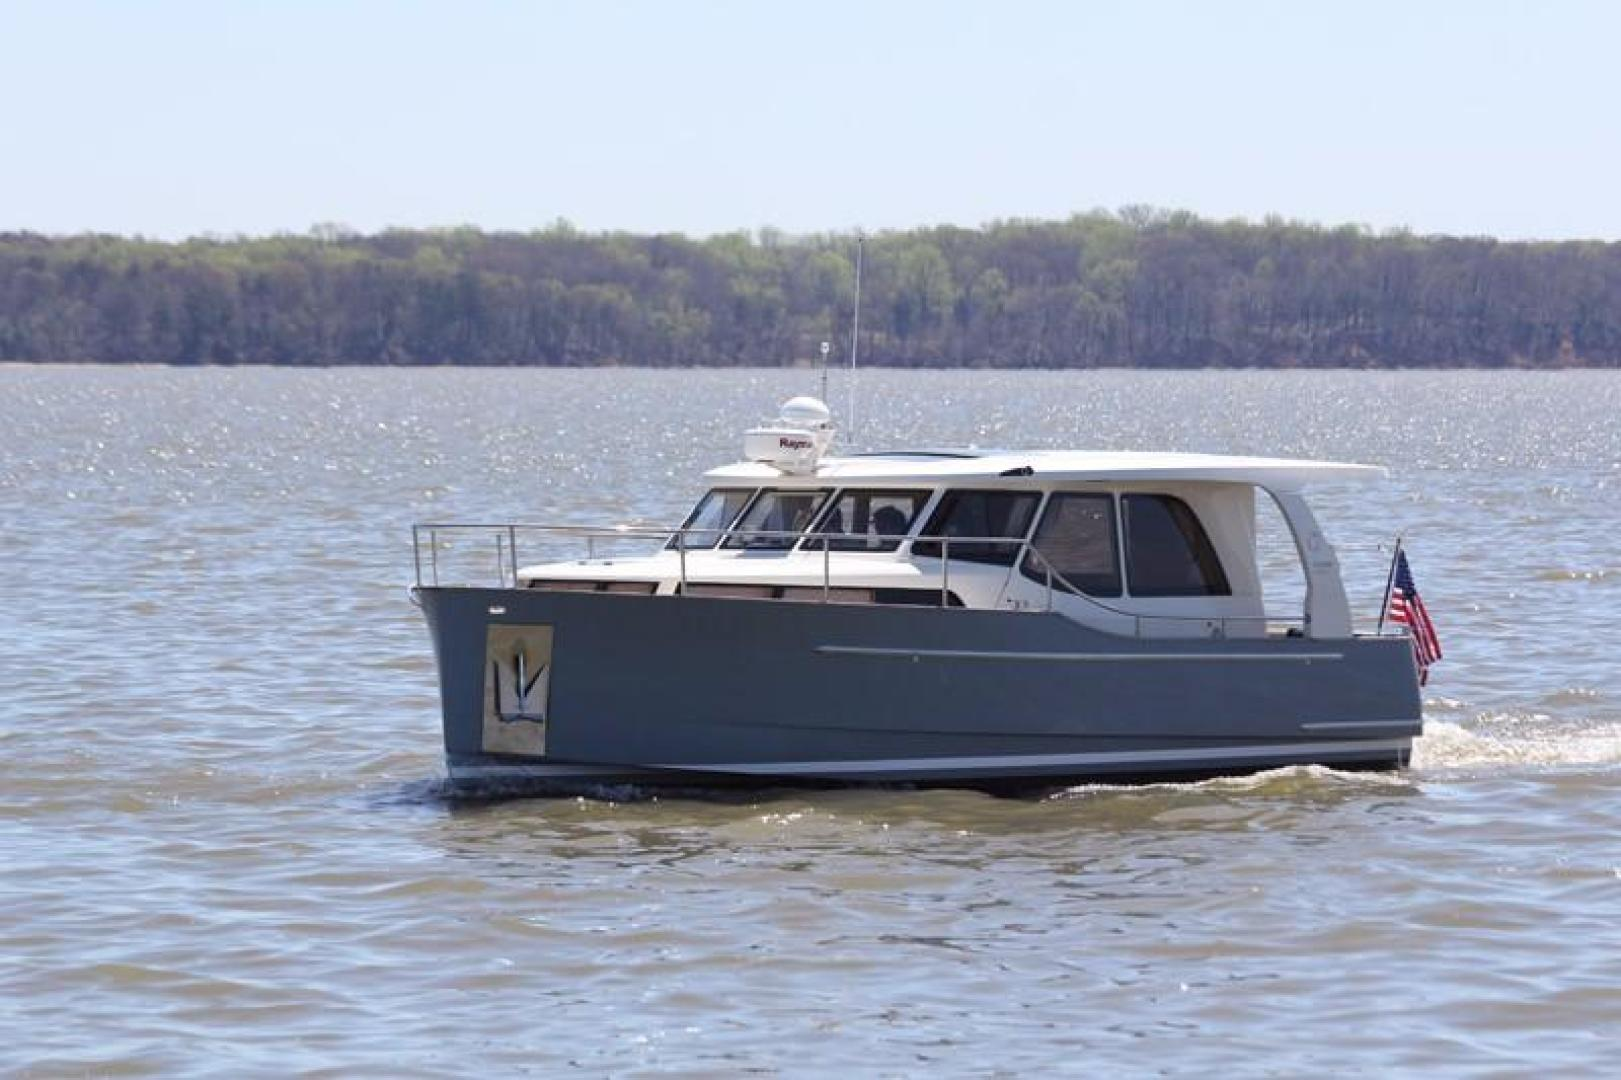 Greenline-33 300 2014-Inspiration Annapolis-Maryland-United States-Underway-923159 | Thumbnail